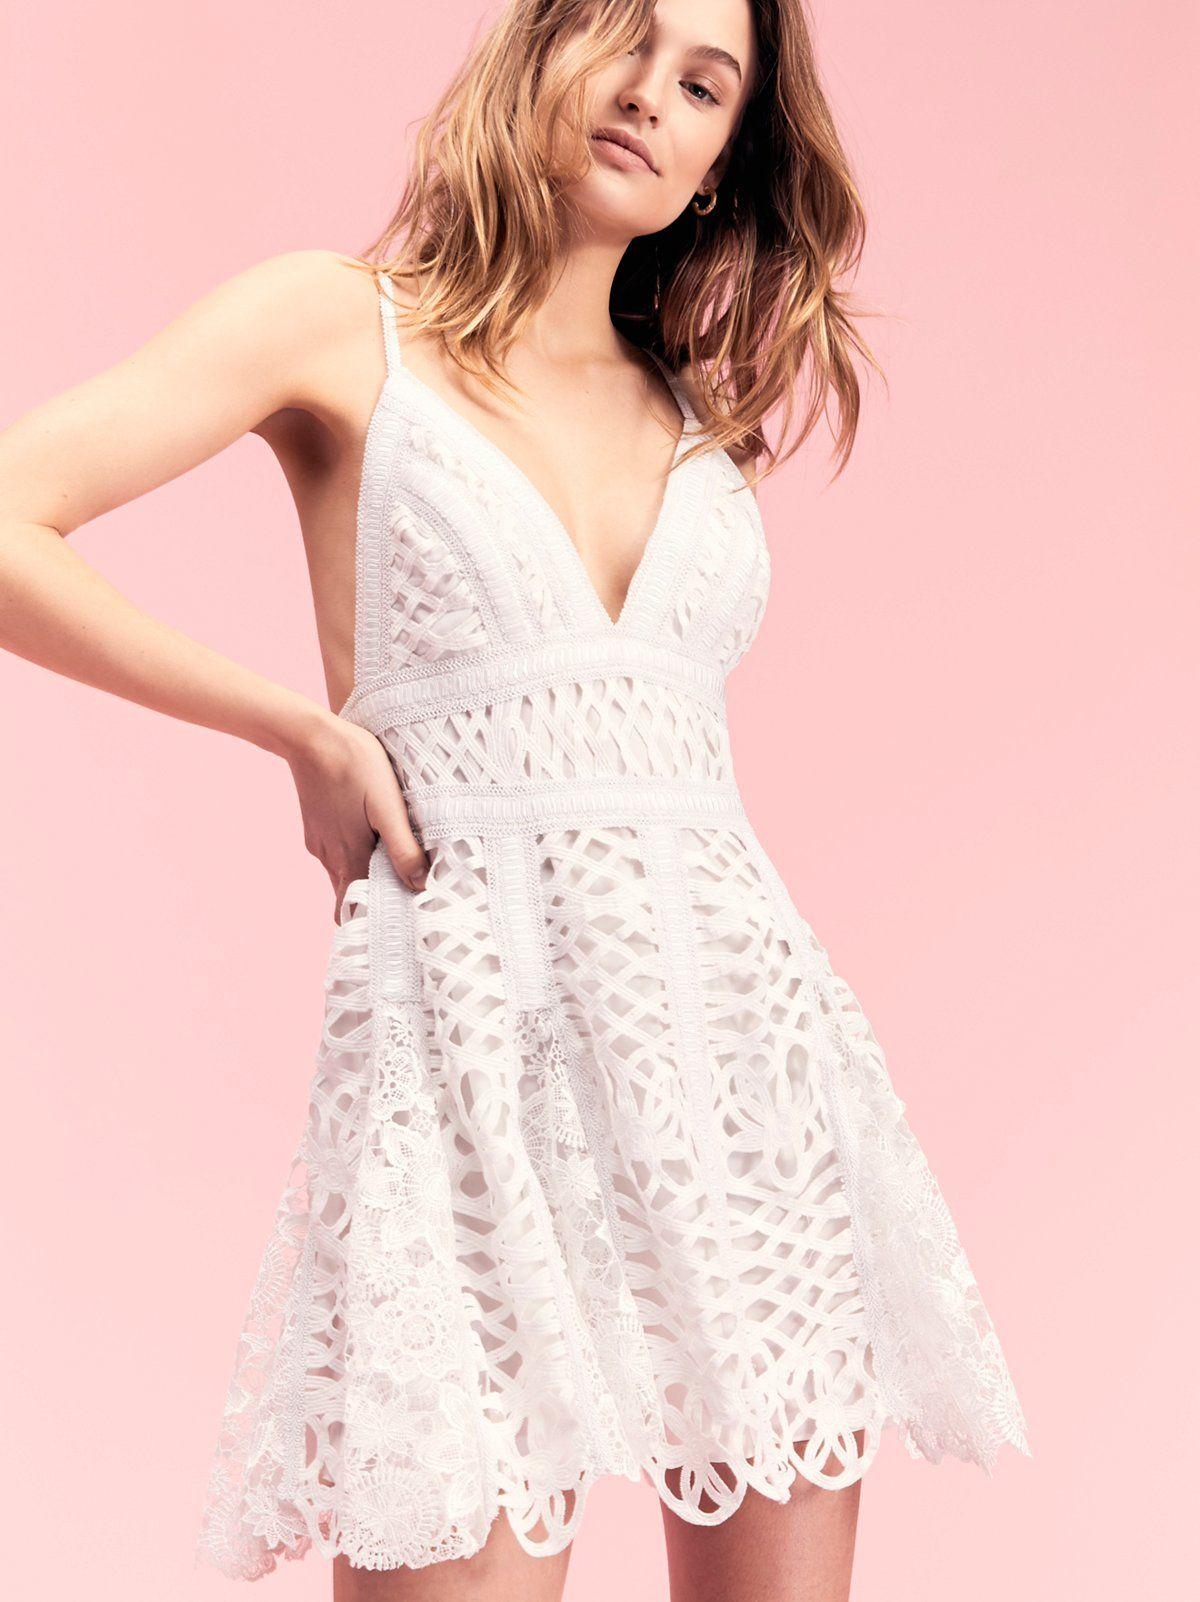 FP One Coast to Cove Mini Dress | Lightweight cotton mini dress ...